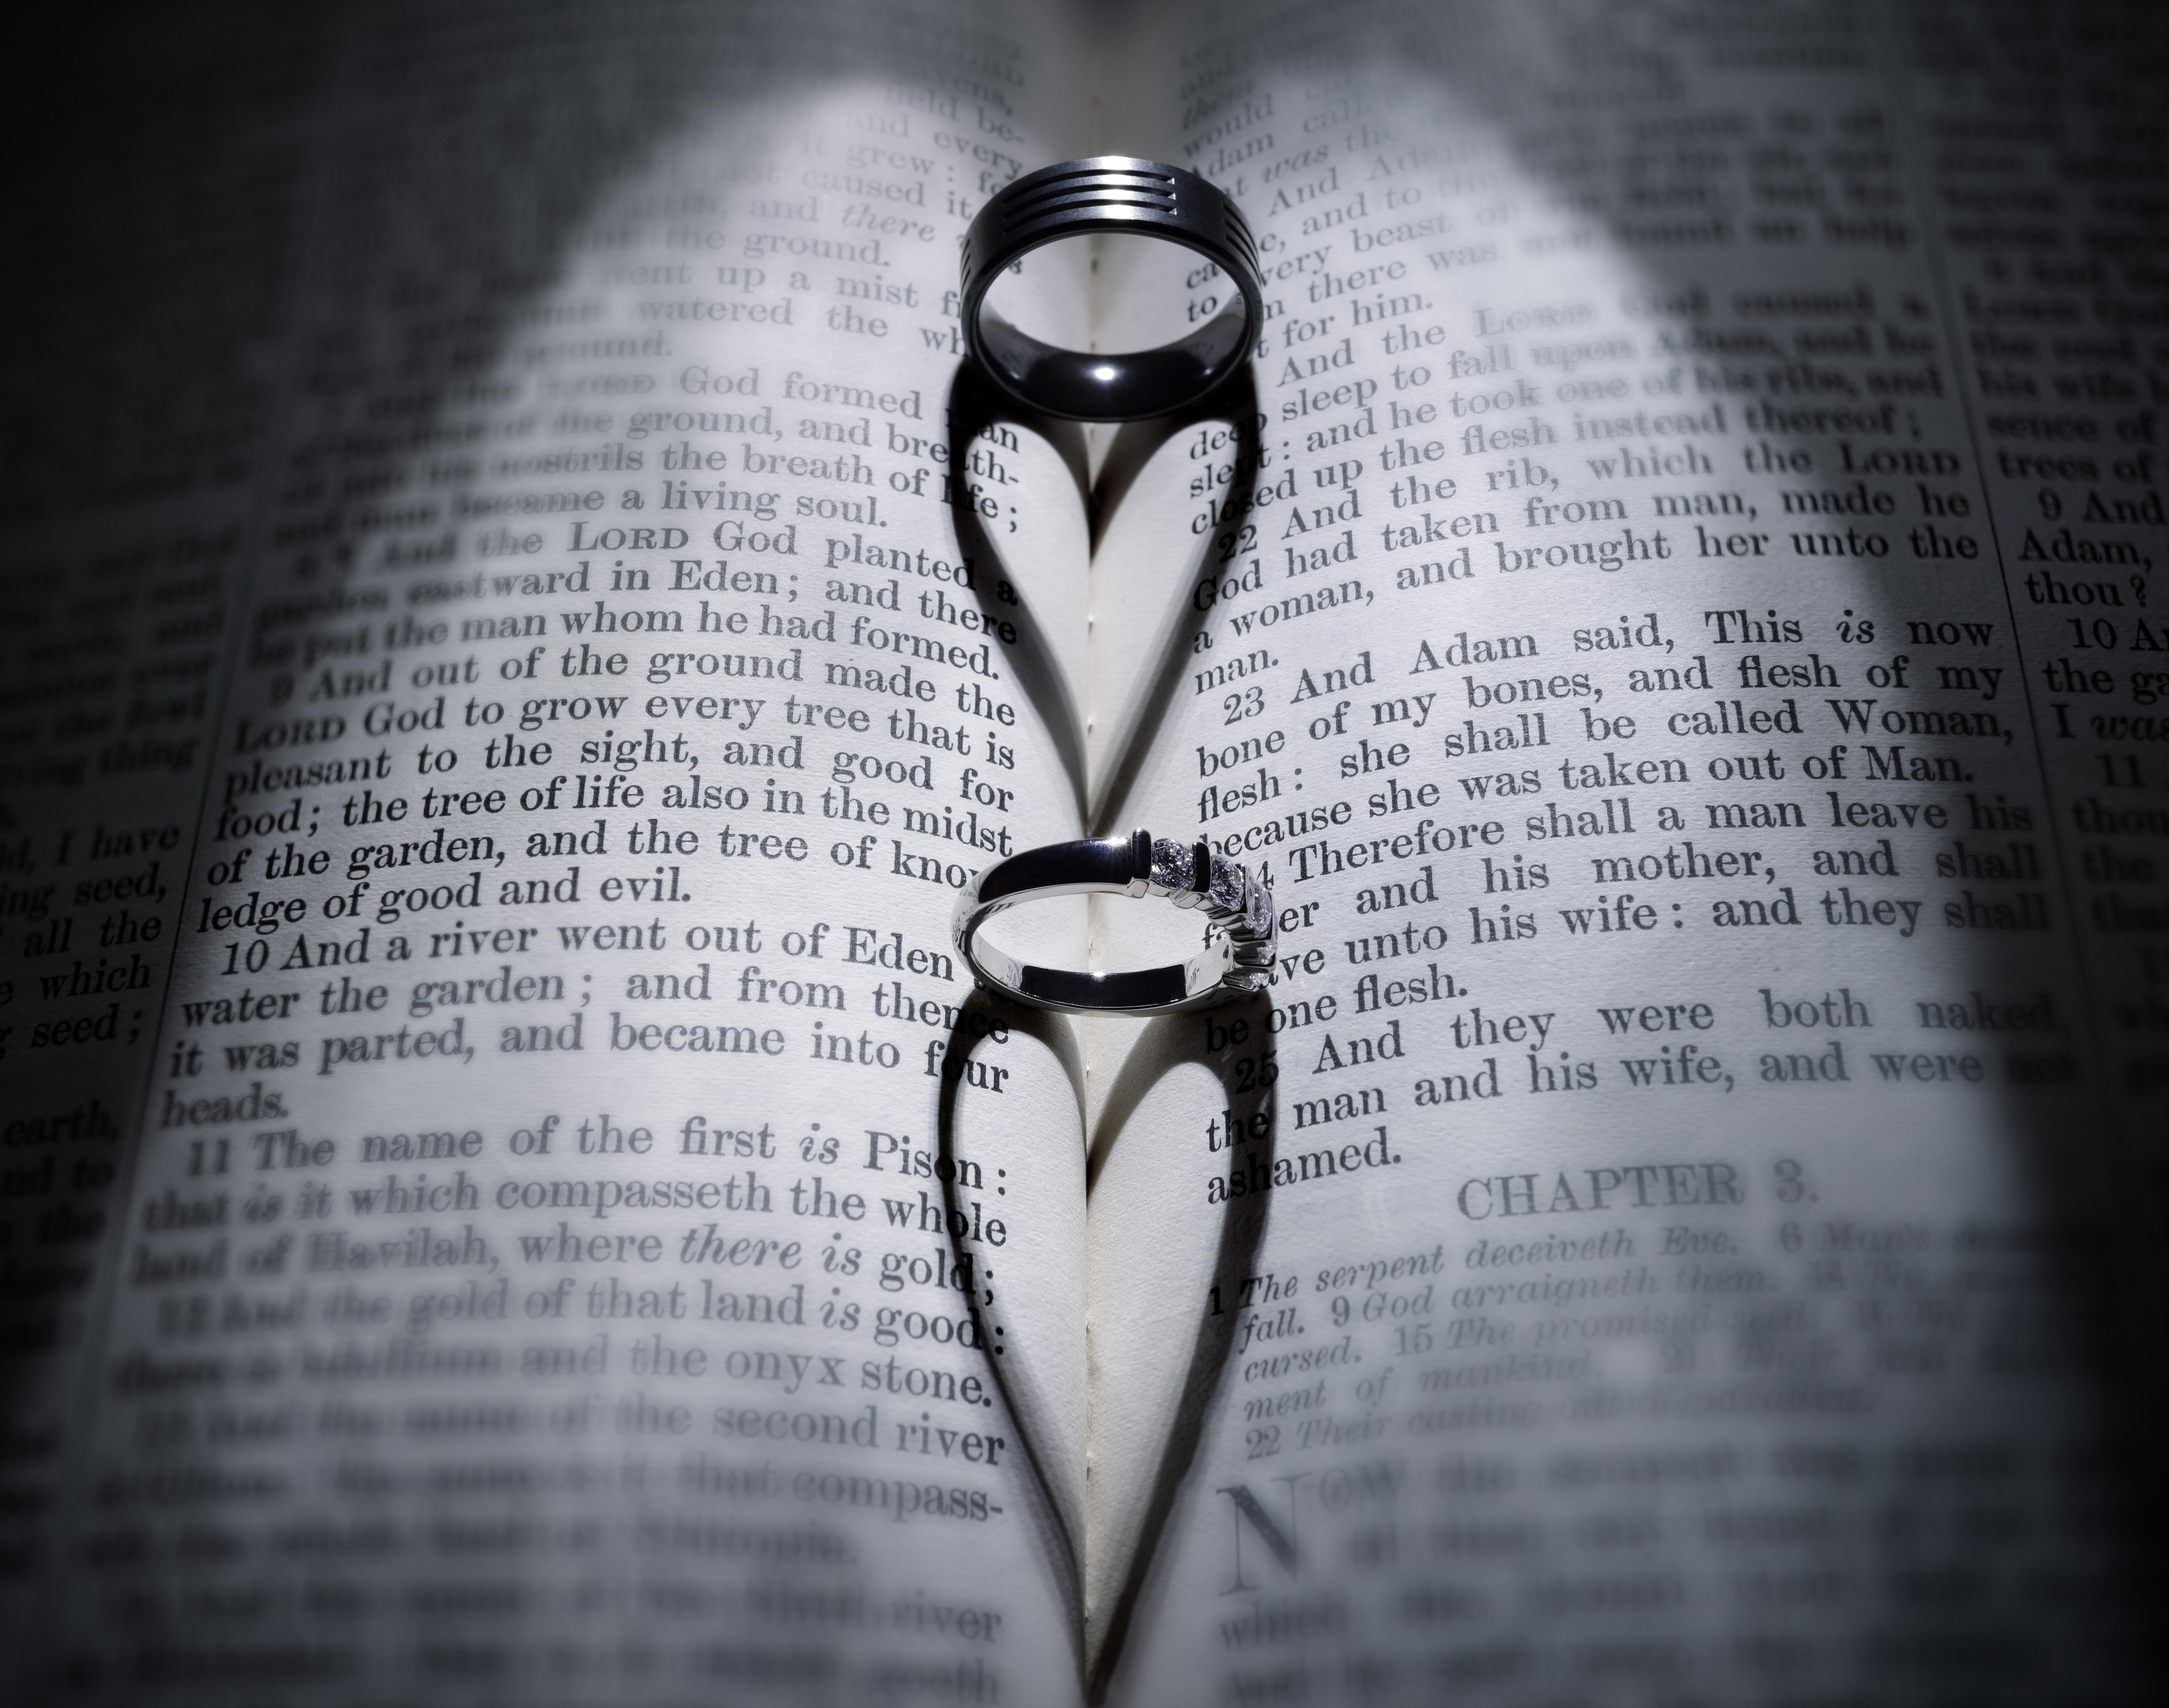 Matrimonio En Problemas Biblia : Tres consejos bíblicos para la pareja cristiana blog.bible